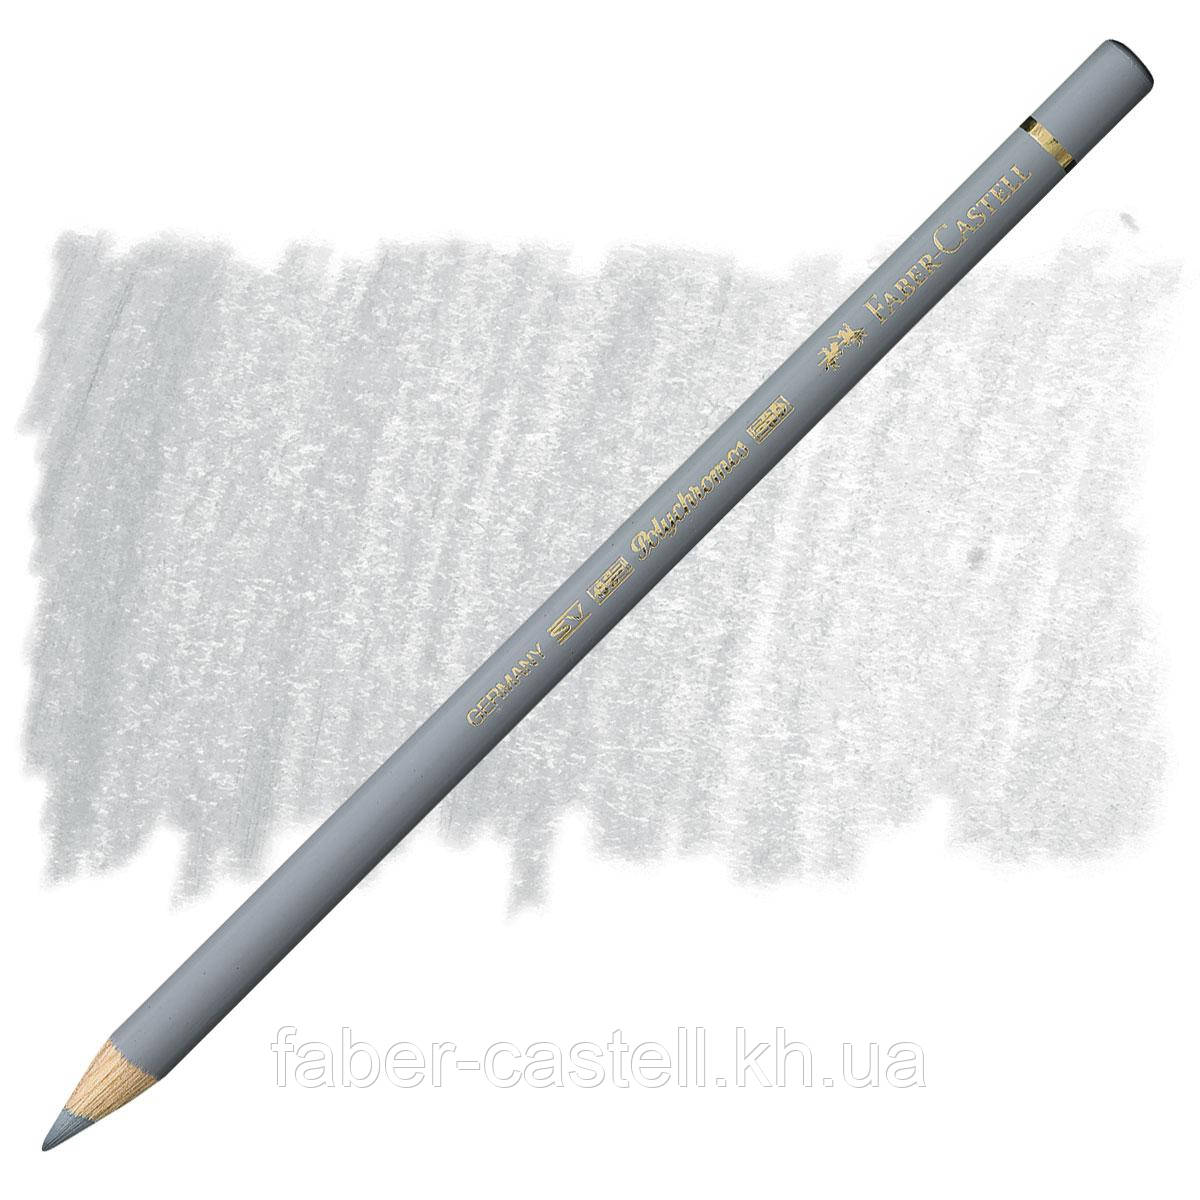 Карандаш цветной Faber-Castell POLYCHROMOS холодный серый Ill  №232 (Cold Gray lII), 110232